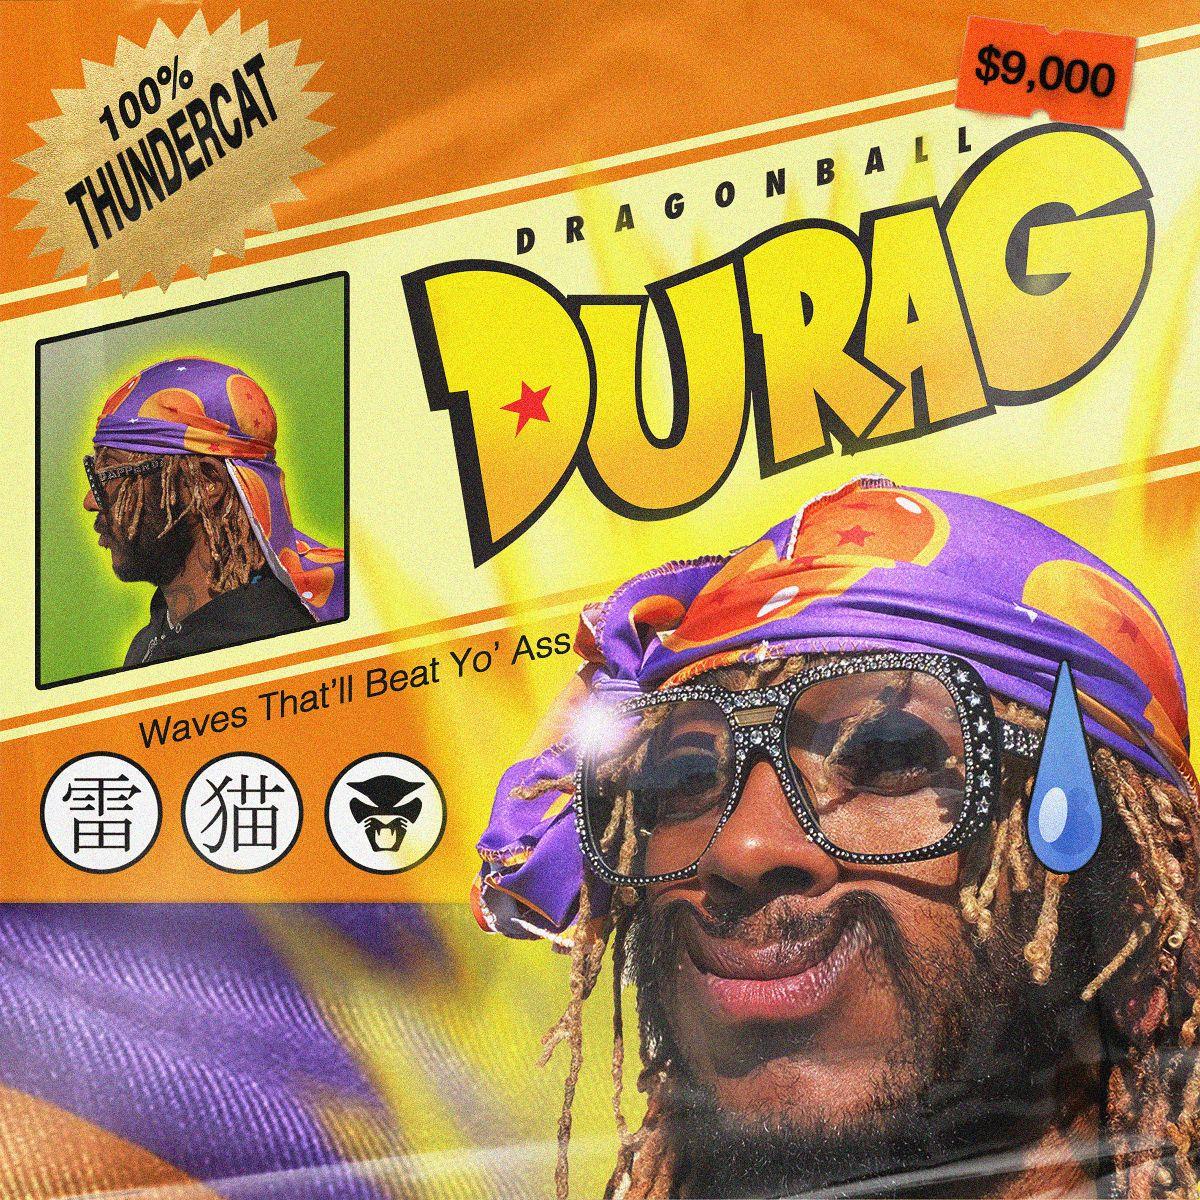 Thundercat Dragonball Durag essential track